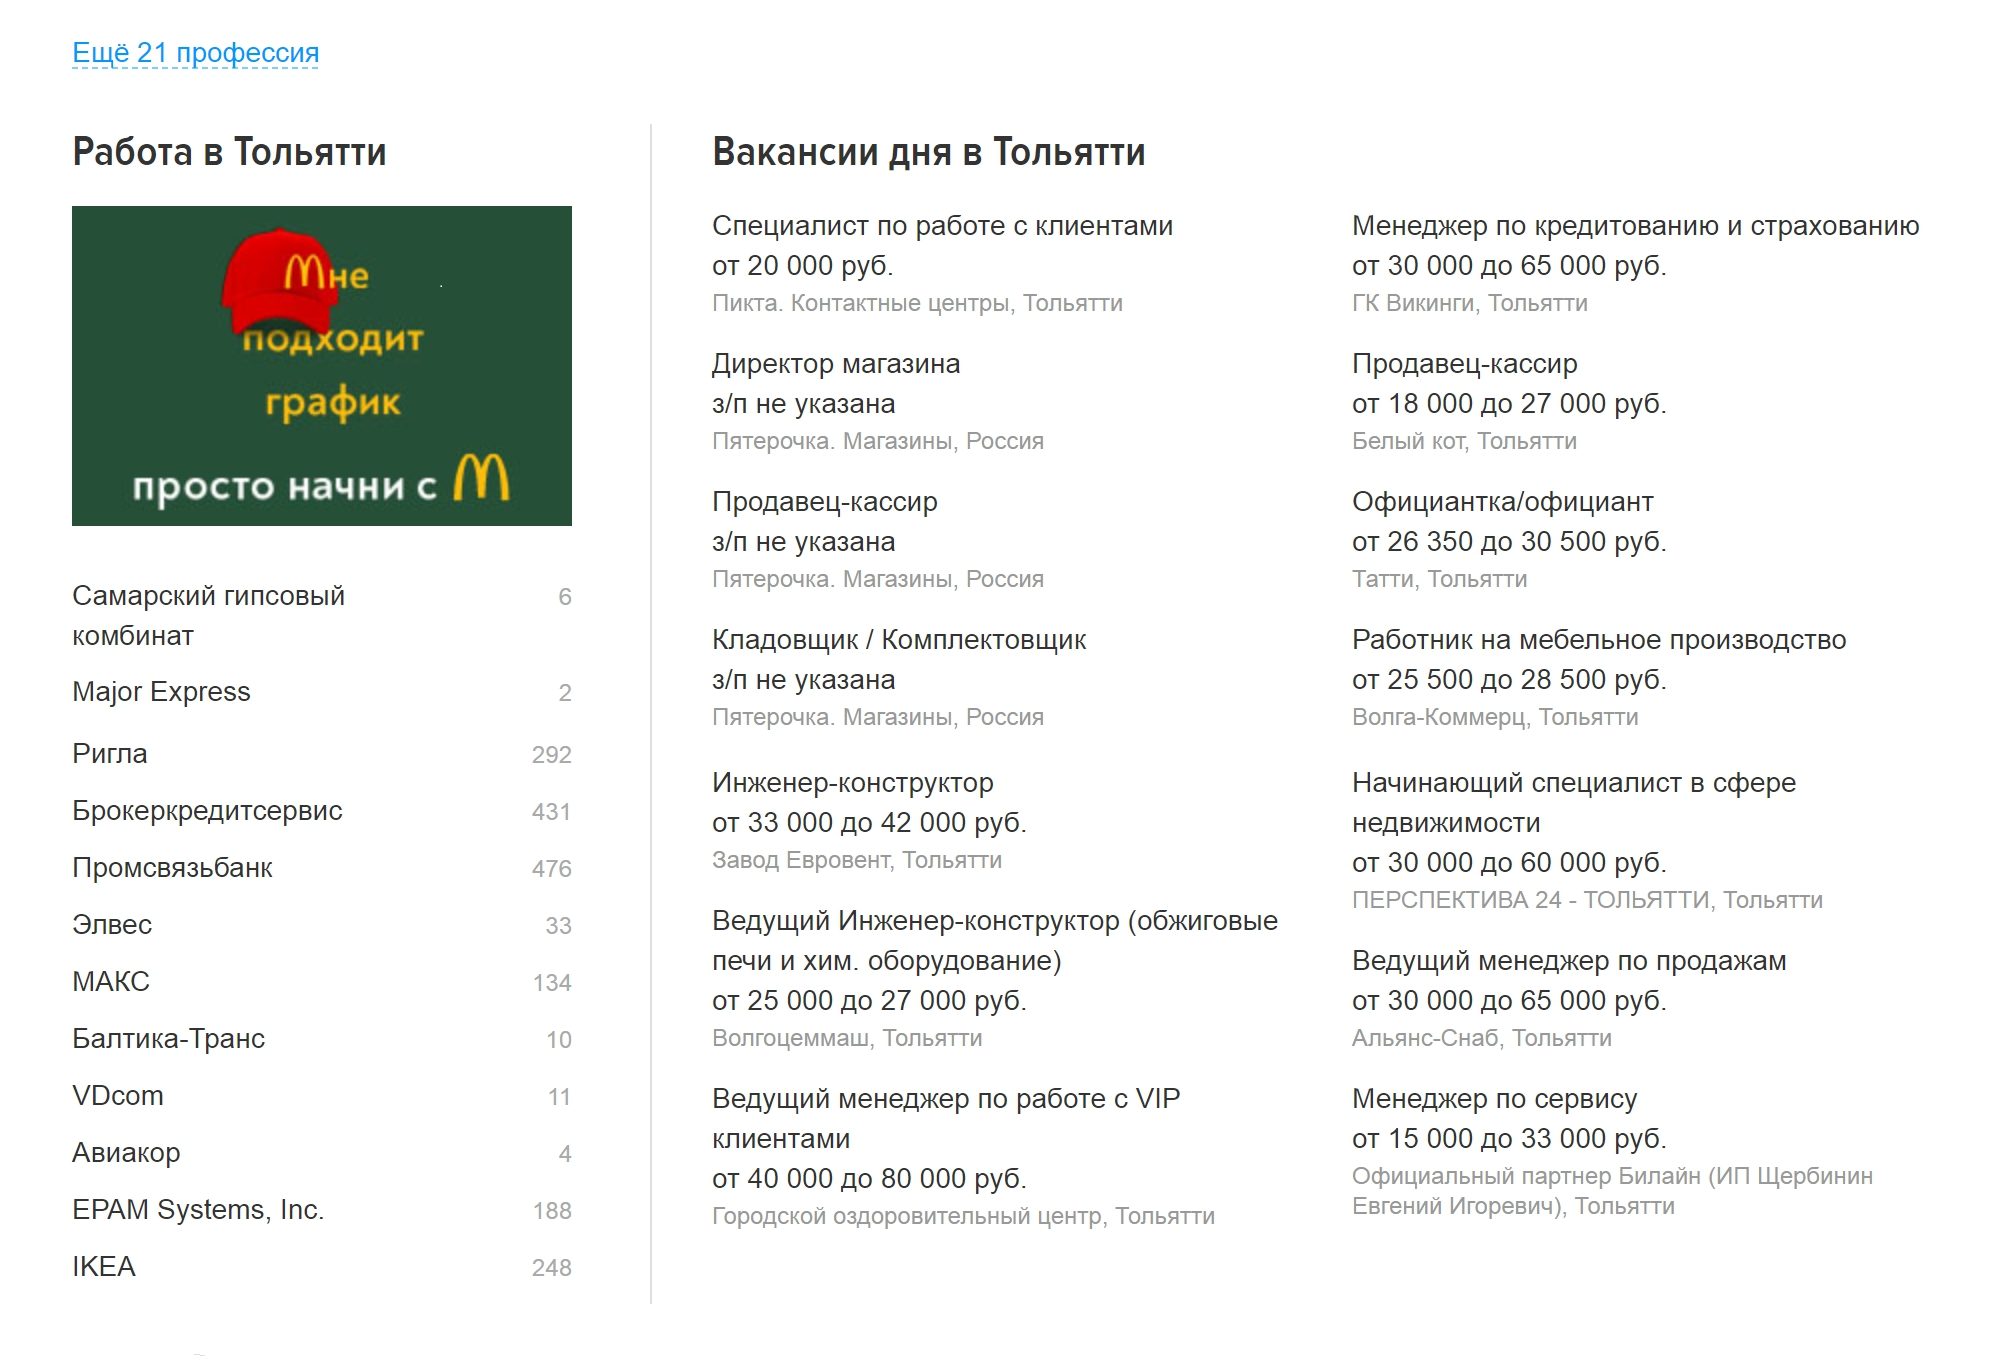 На «Хедхантере» хирургу в Тольятти предлагают зарплату от 40 000<span class=ruble>Р</span>, электромонтеру и сварщику — от 30 000<span class=ruble>Р</span>